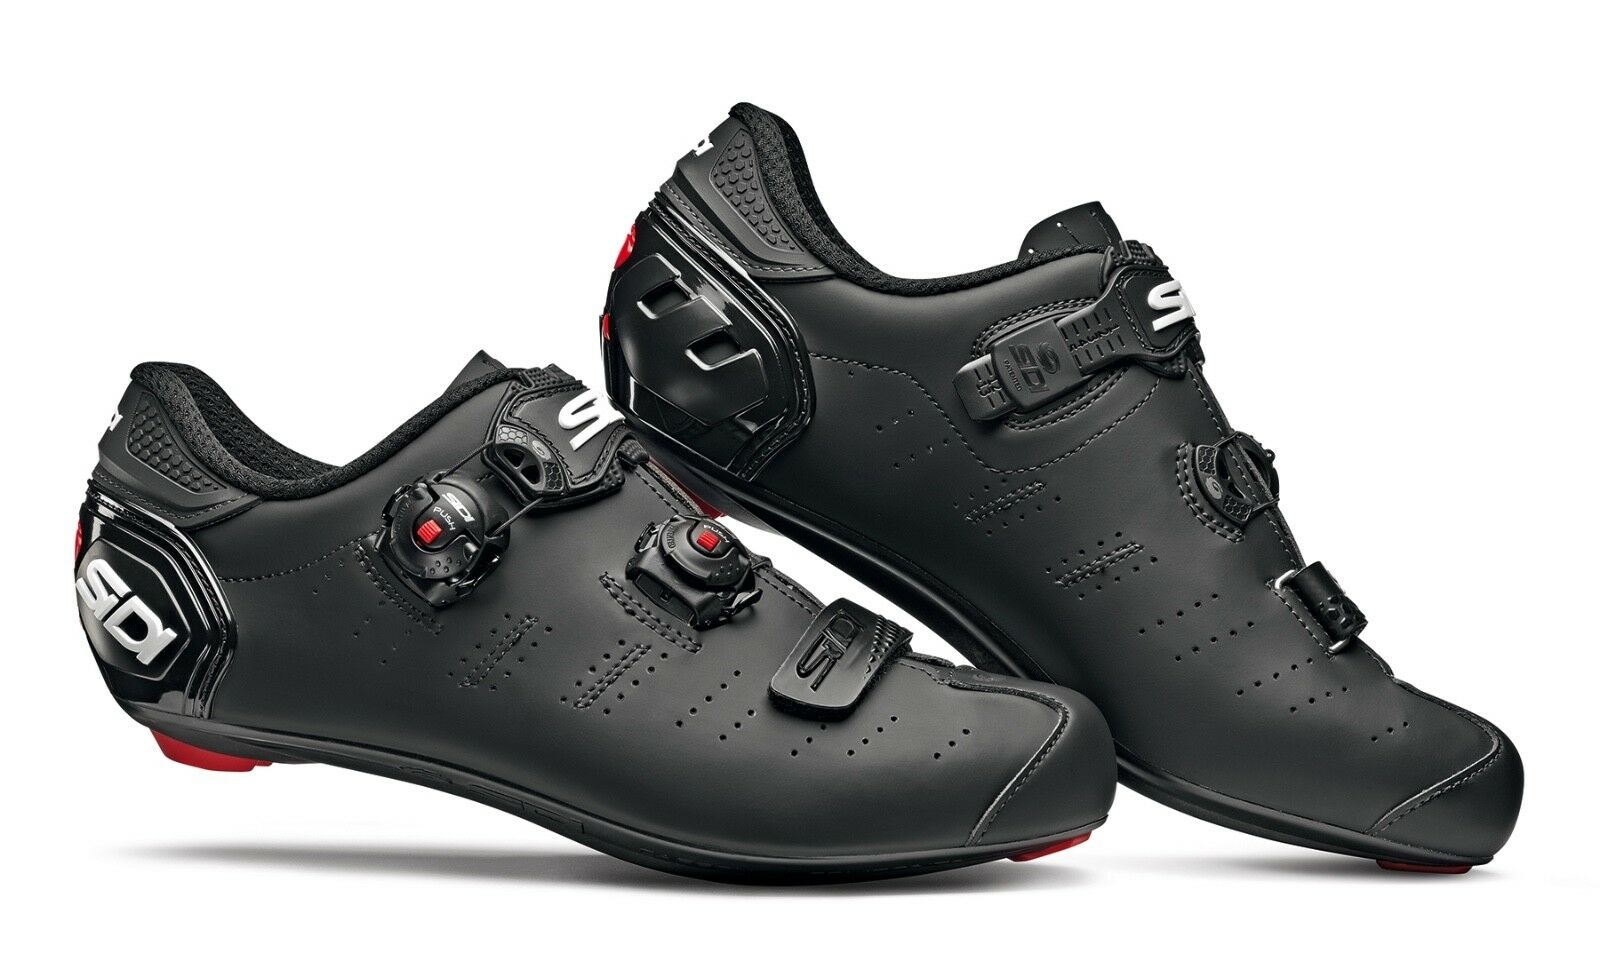 Schuhe SIDI ERGO 5 MEGA MATT NERO Größe 47